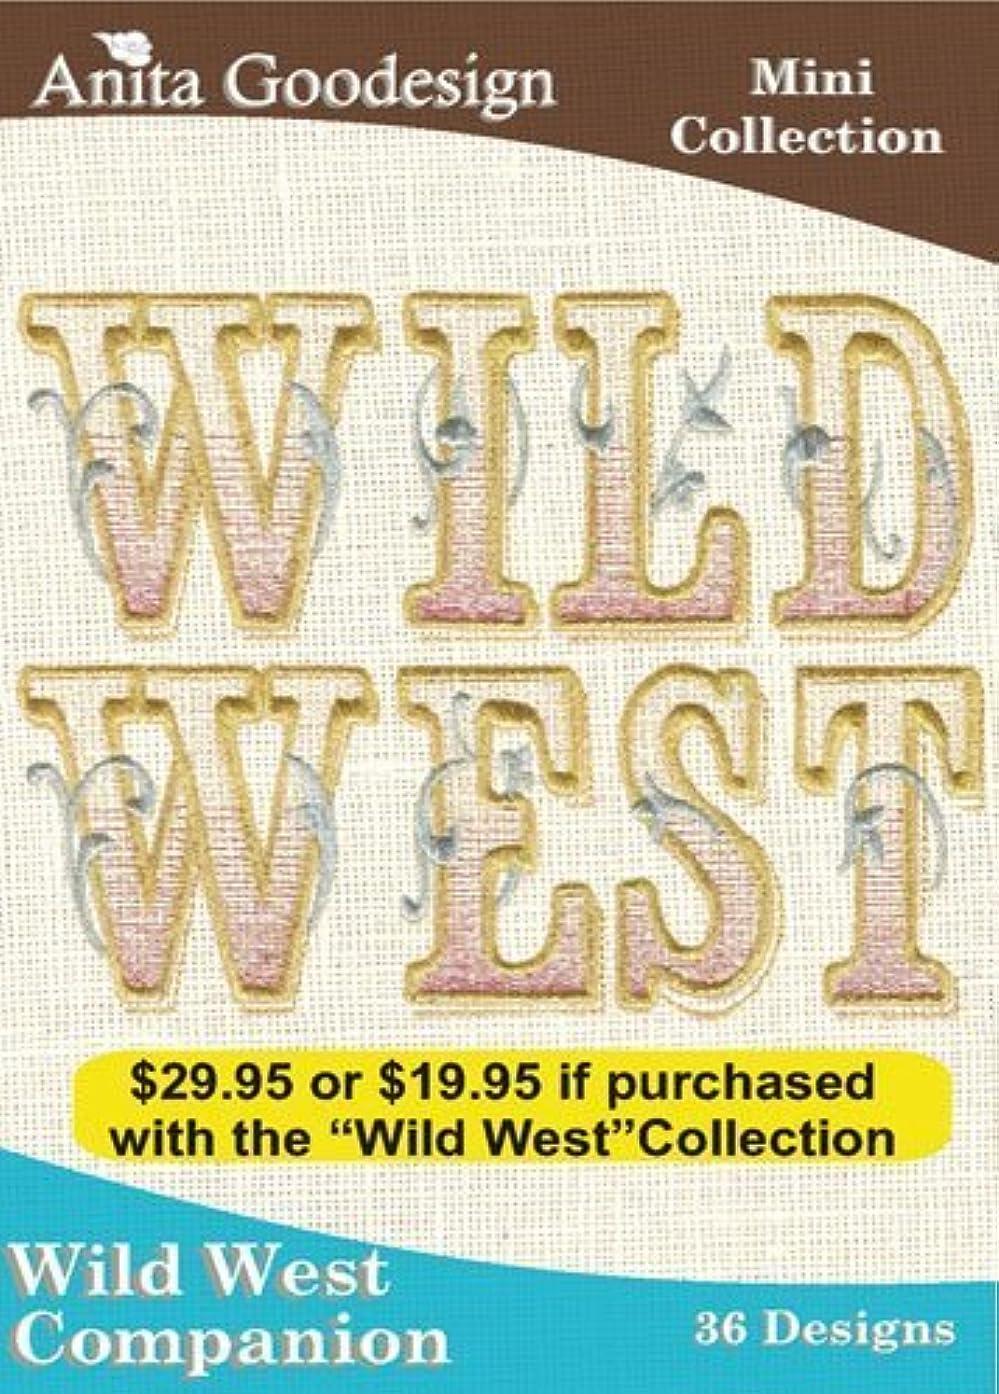 Anita Goodesign Embroidery Designs Wild West Companion